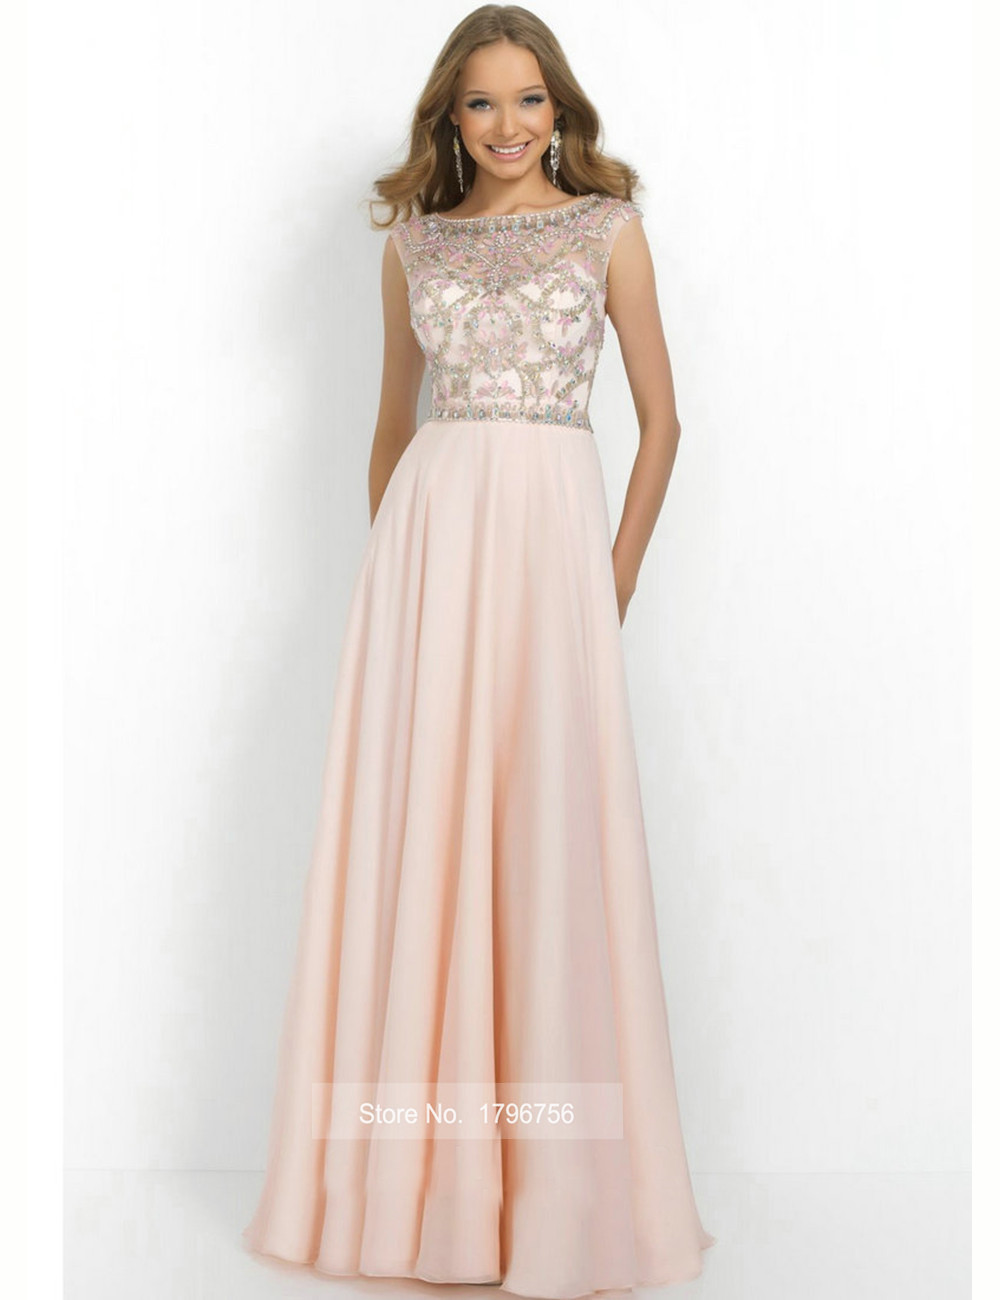 Cheap Blush Party Dresses, find Blush Party Dresses deals on line at ...